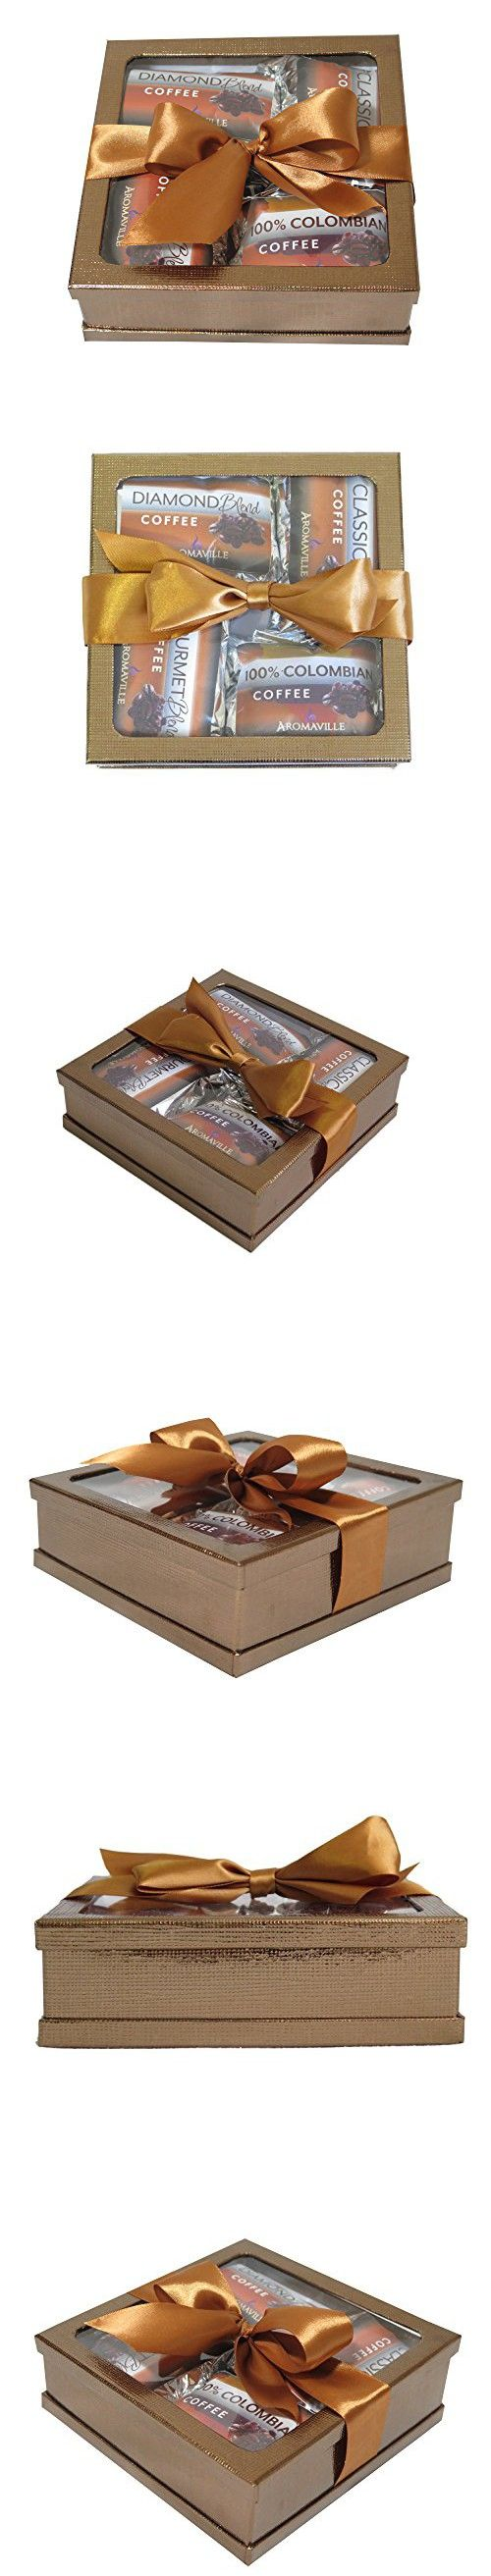 Gourmet Coffee Gift Set - Coffee Gift Basket - Coffee Lovers Gifts - Coffee Gift Set - Best Gift for Coworkers, Friends, Boss Etc. (Gold)